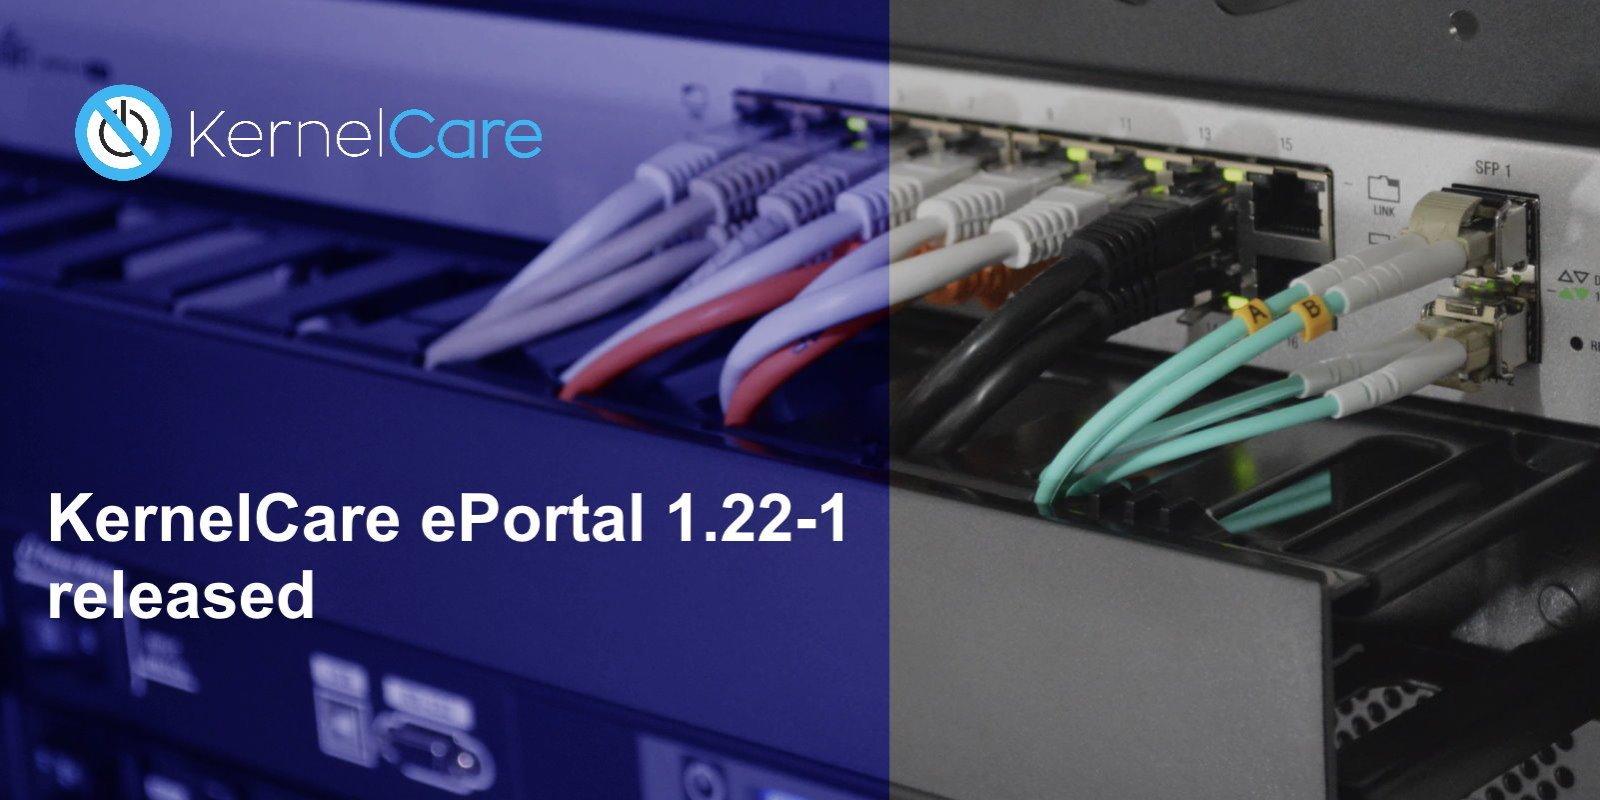 KernelCare ePortal 1.22-1 released